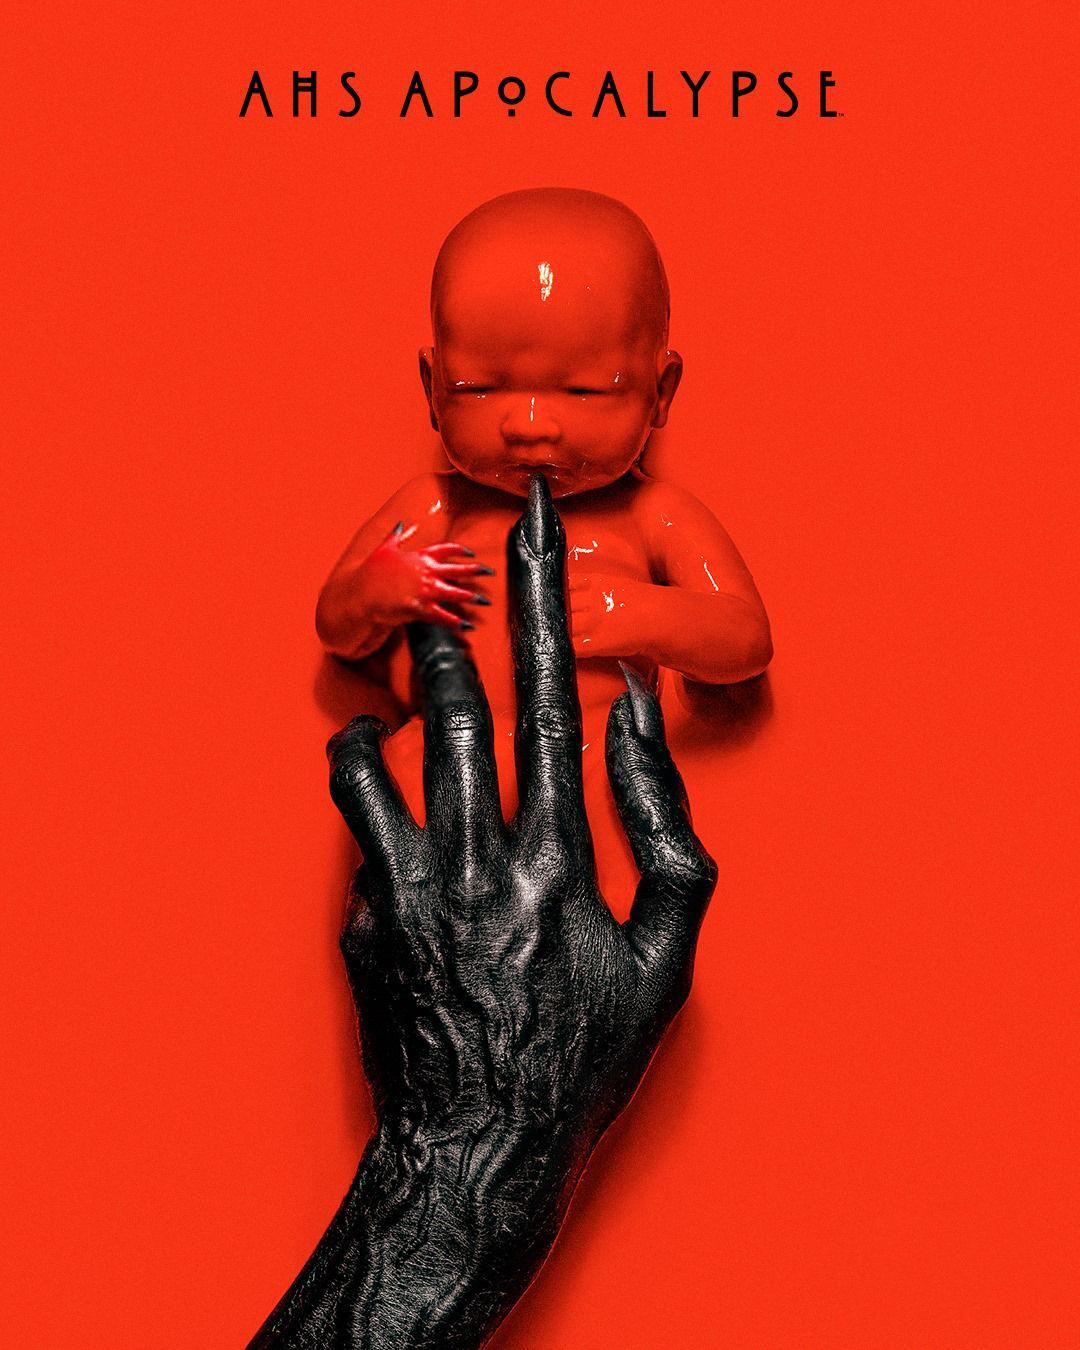 American Horror Story [Apocalypse] [Season 8] [2018] [DVDR] [NTSC] [Latino]